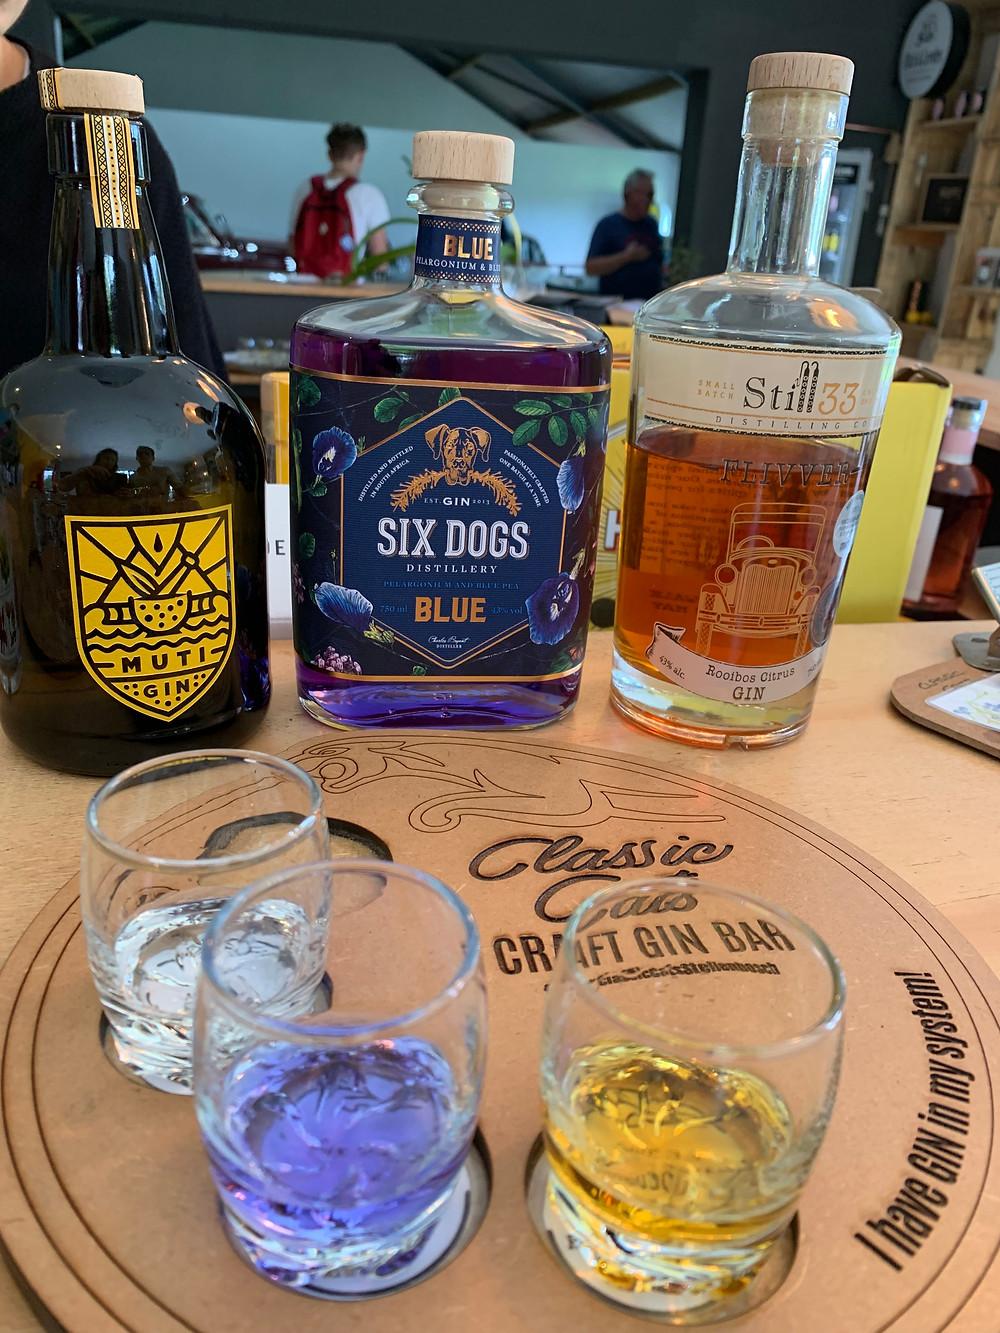 Gin tasting choices at Classic Cats Craft Gin Bar at Vredenheim